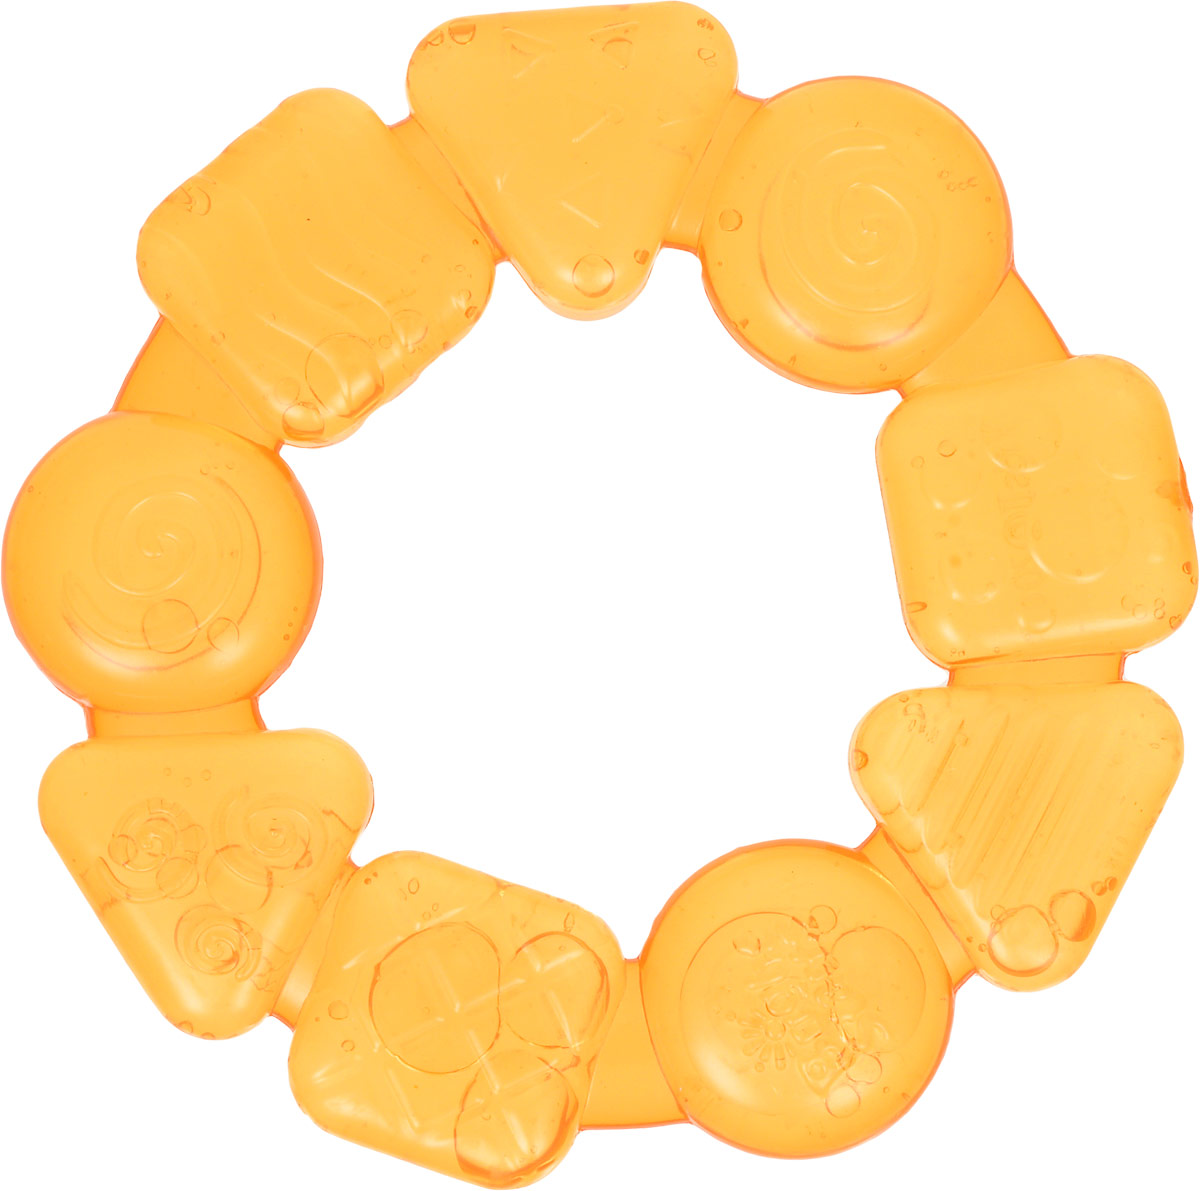 Bright Starts Прорезыватель Карамельный круг цвет желтый игрушка прорезыватель bright starts гусеничка оранжевая